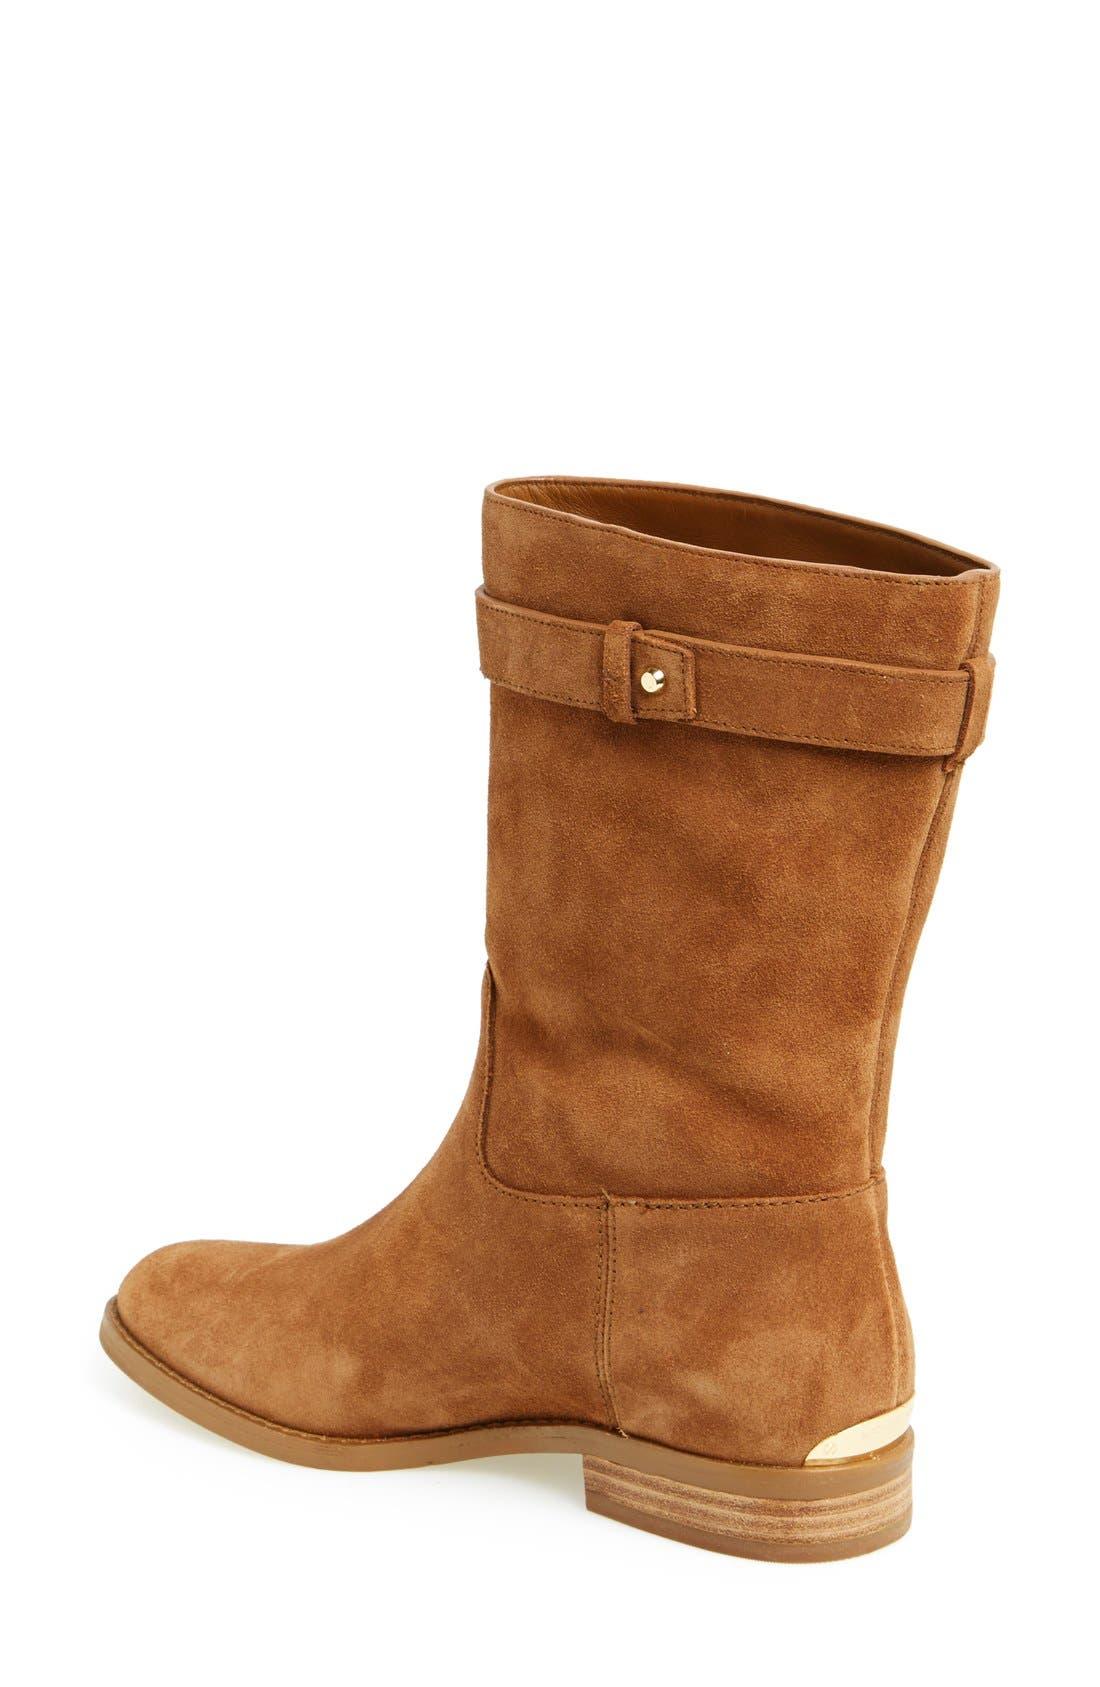 Alternate Image 2  - MICHAEL Michael Kors 'Rhea' Suede Boot (Women)